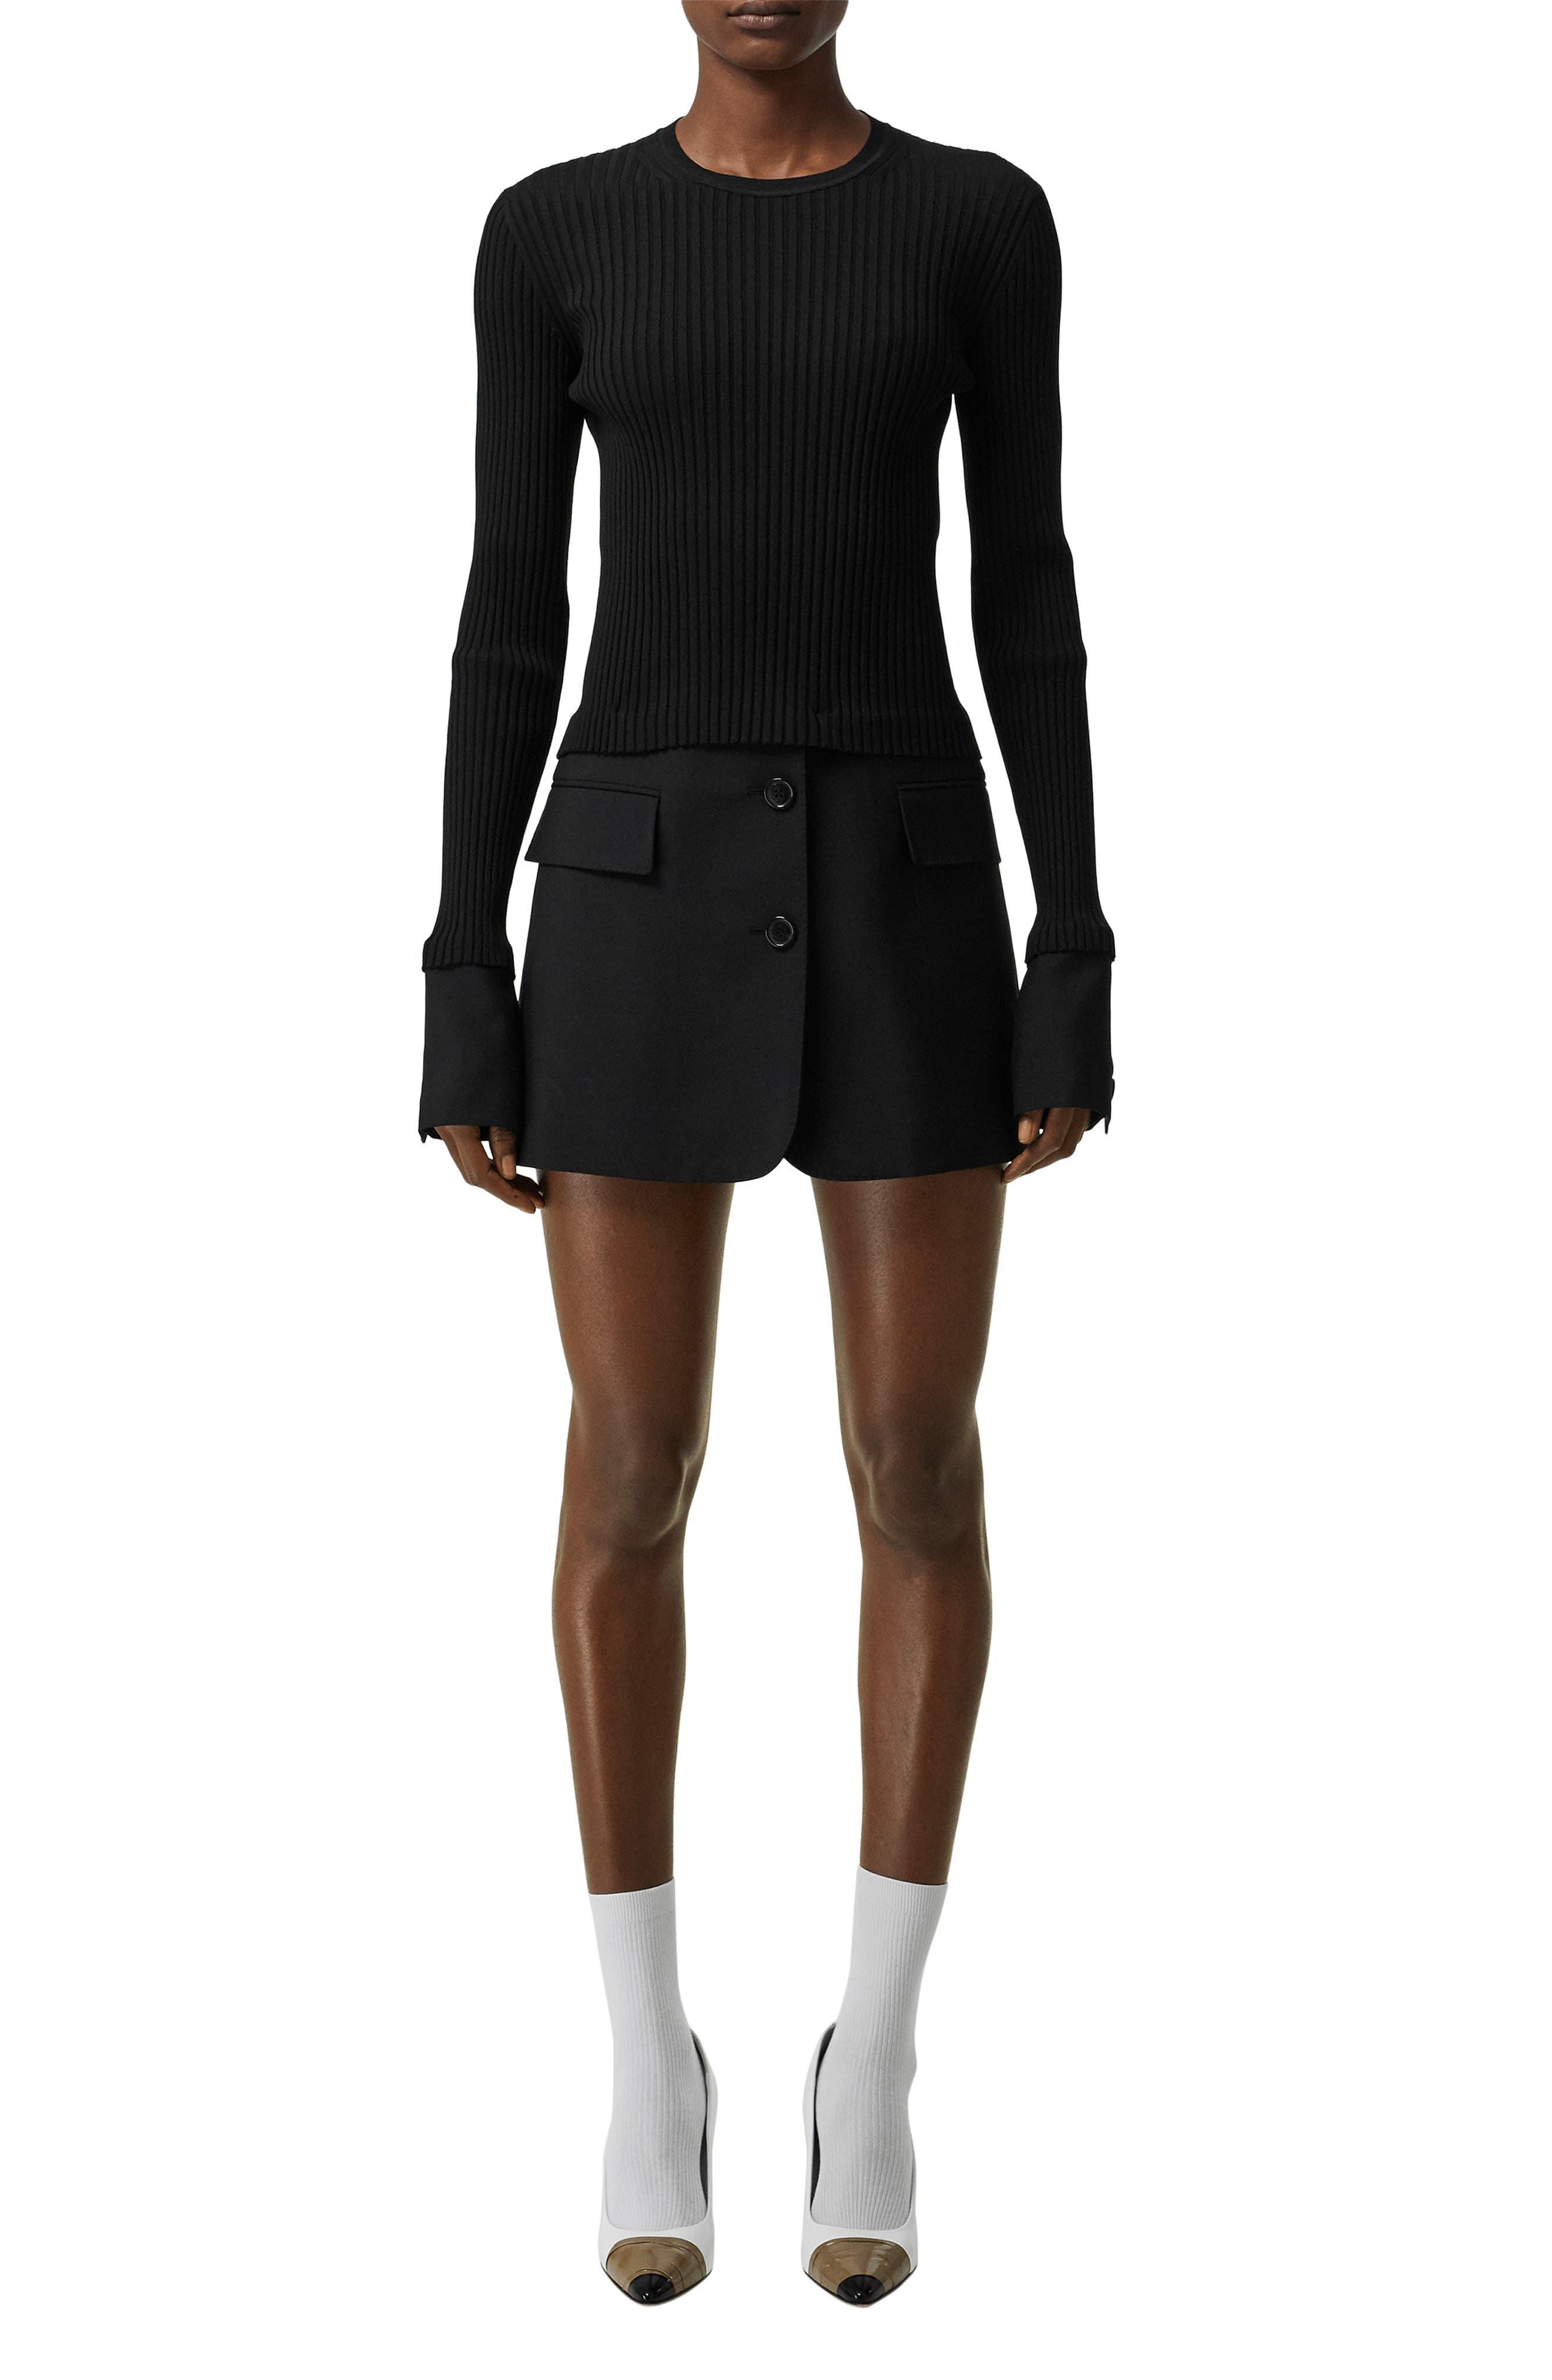 Burberry Long Sleeve Tailored Hem Rib Sweater Dress, Black